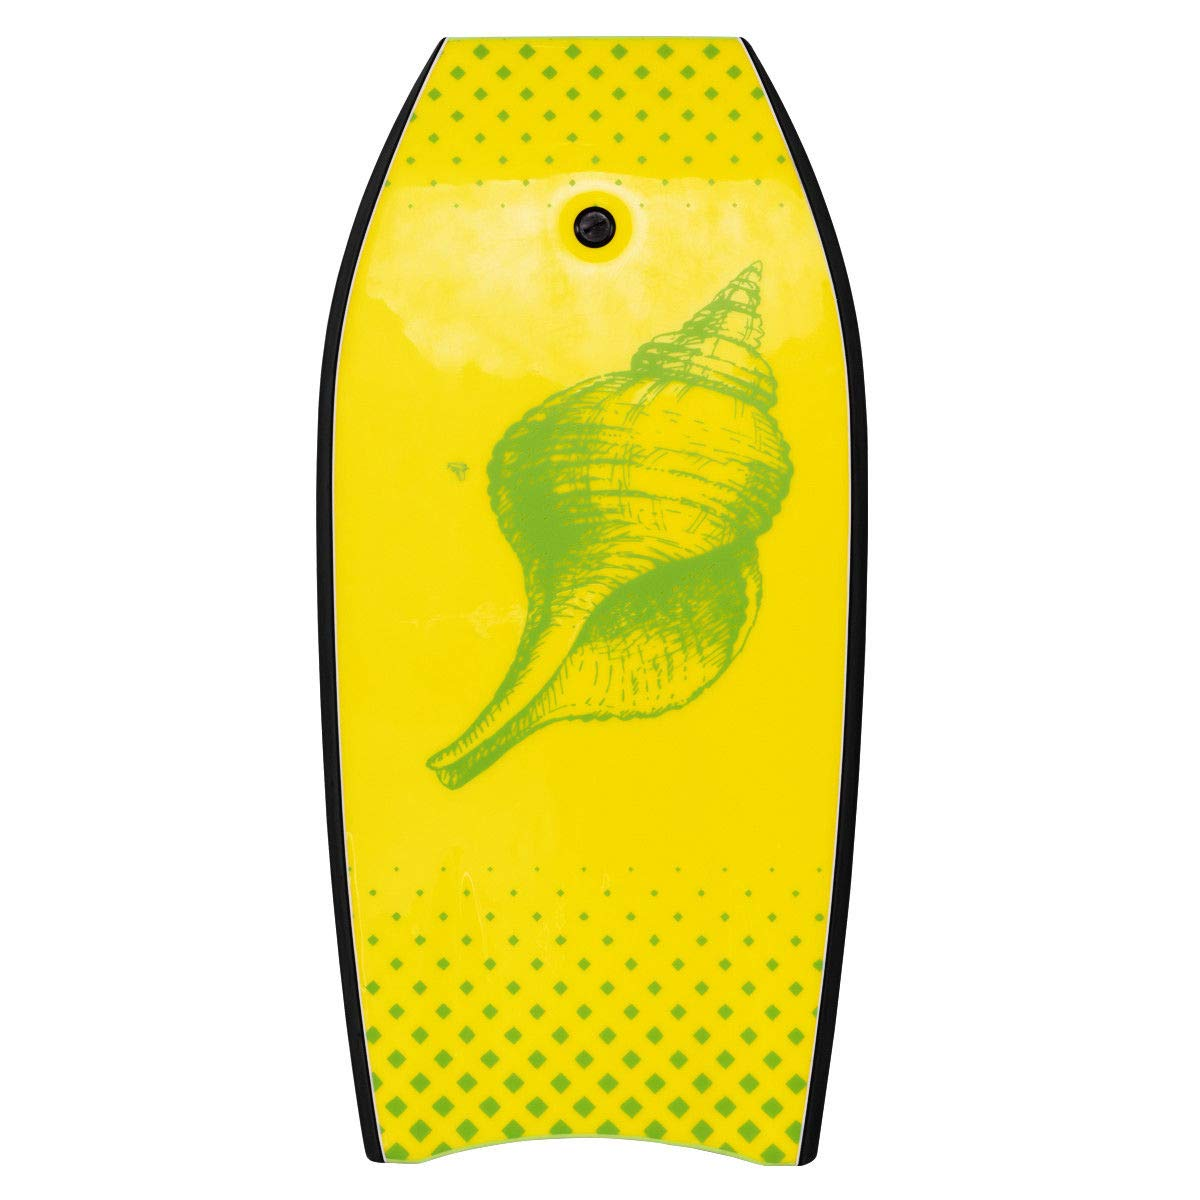 oldzon 41'' Lightweight Super Bodyboard Surfing W/Leash IXPE Deck EPS Core Boarding Ebook